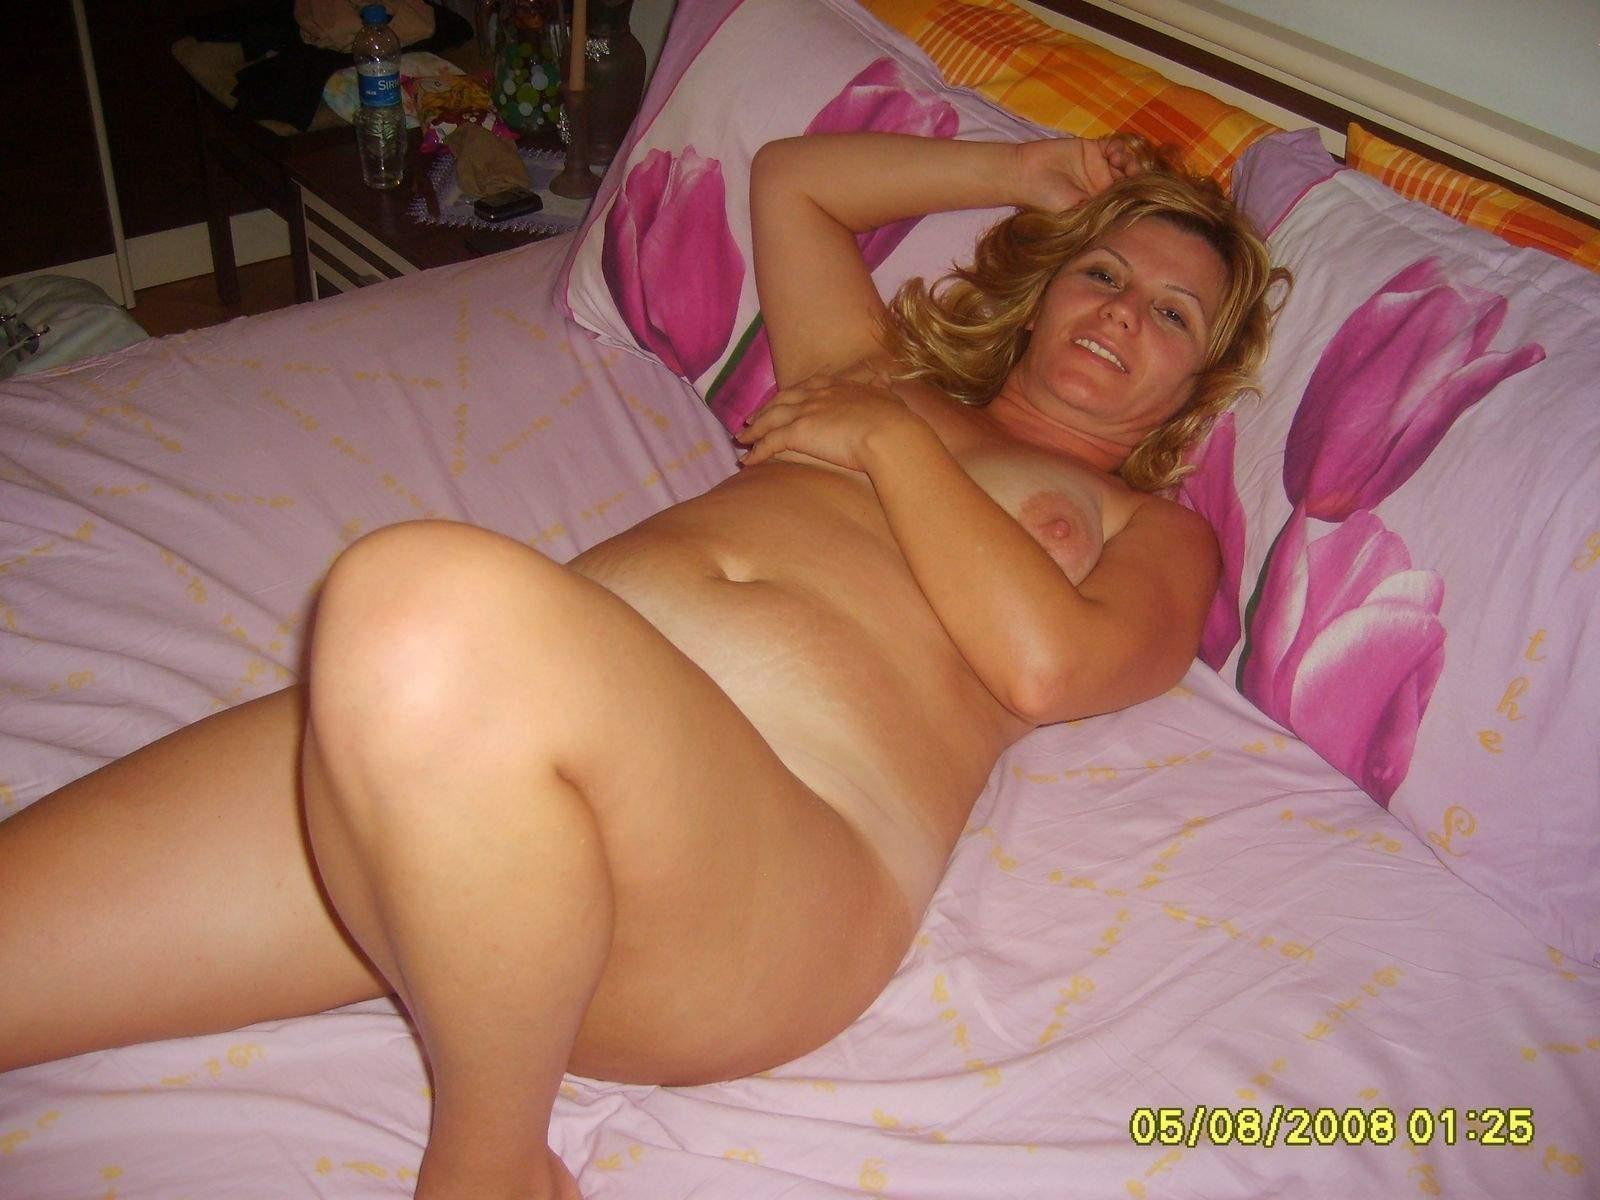 Chubby regular naked amateurs sorry